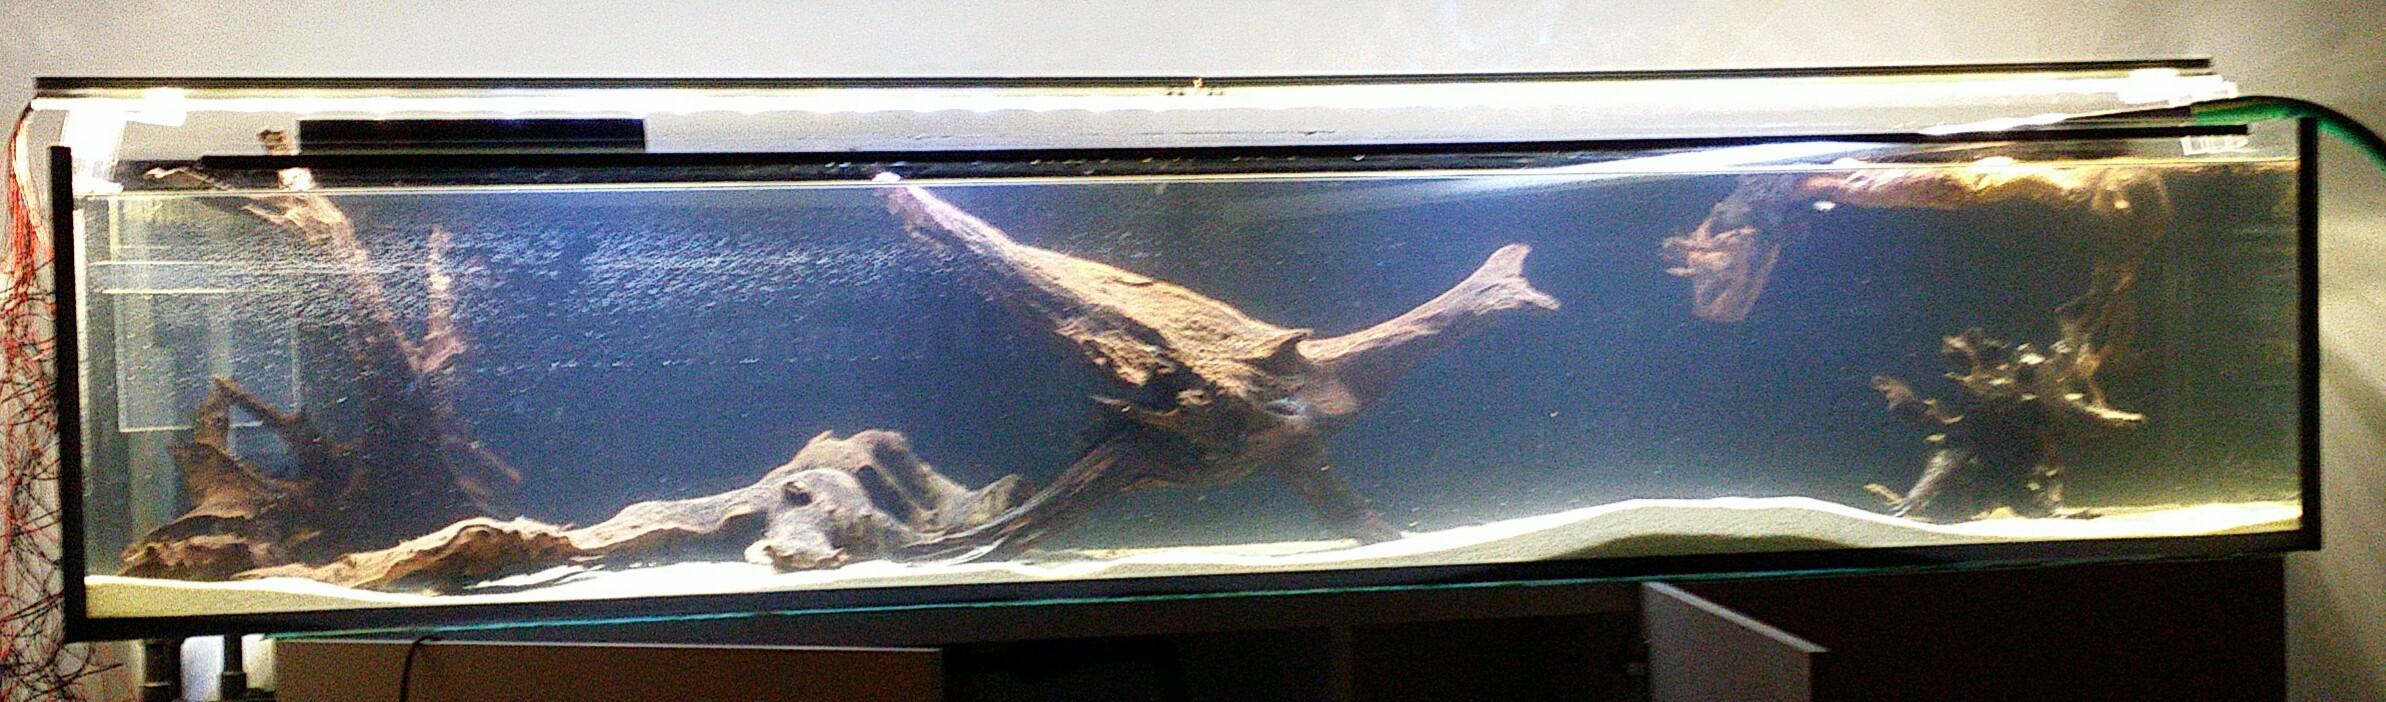 neues becken 200x40x40 seite 2 unsere aquarien vorgestellt aquaristik forum. Black Bedroom Furniture Sets. Home Design Ideas